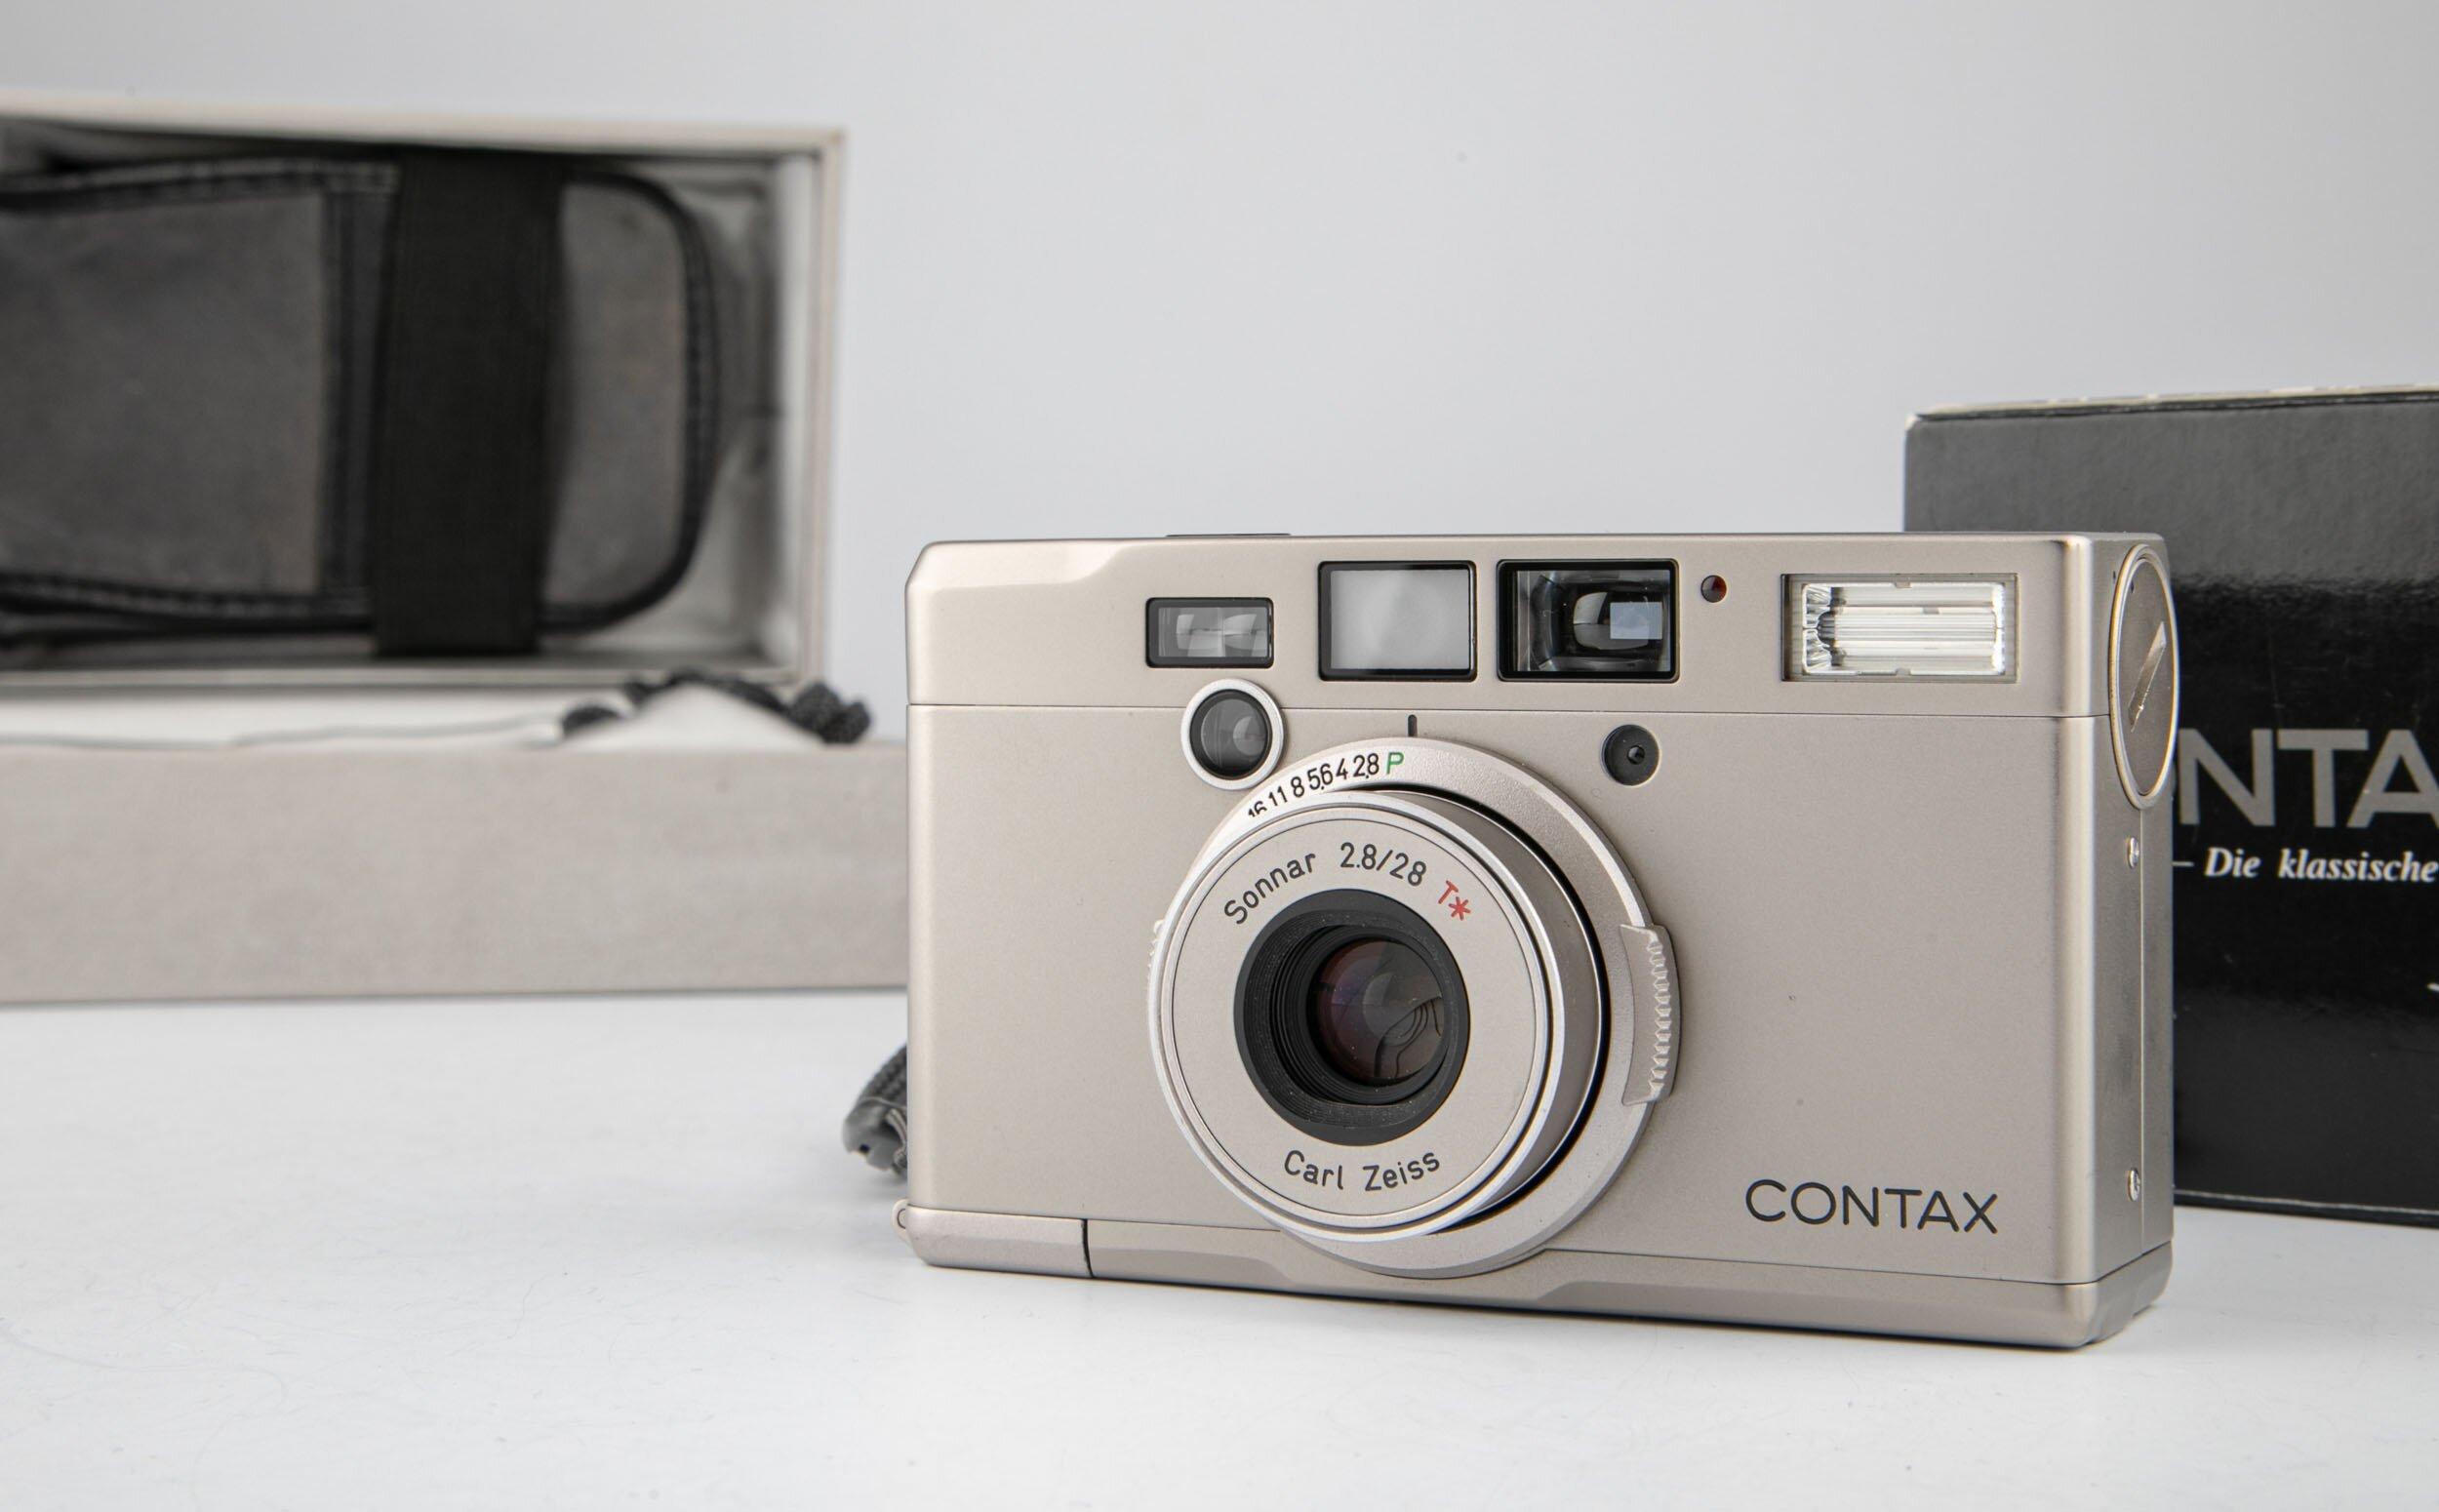 Contax Tix 28mm F2.8 T Sonnar